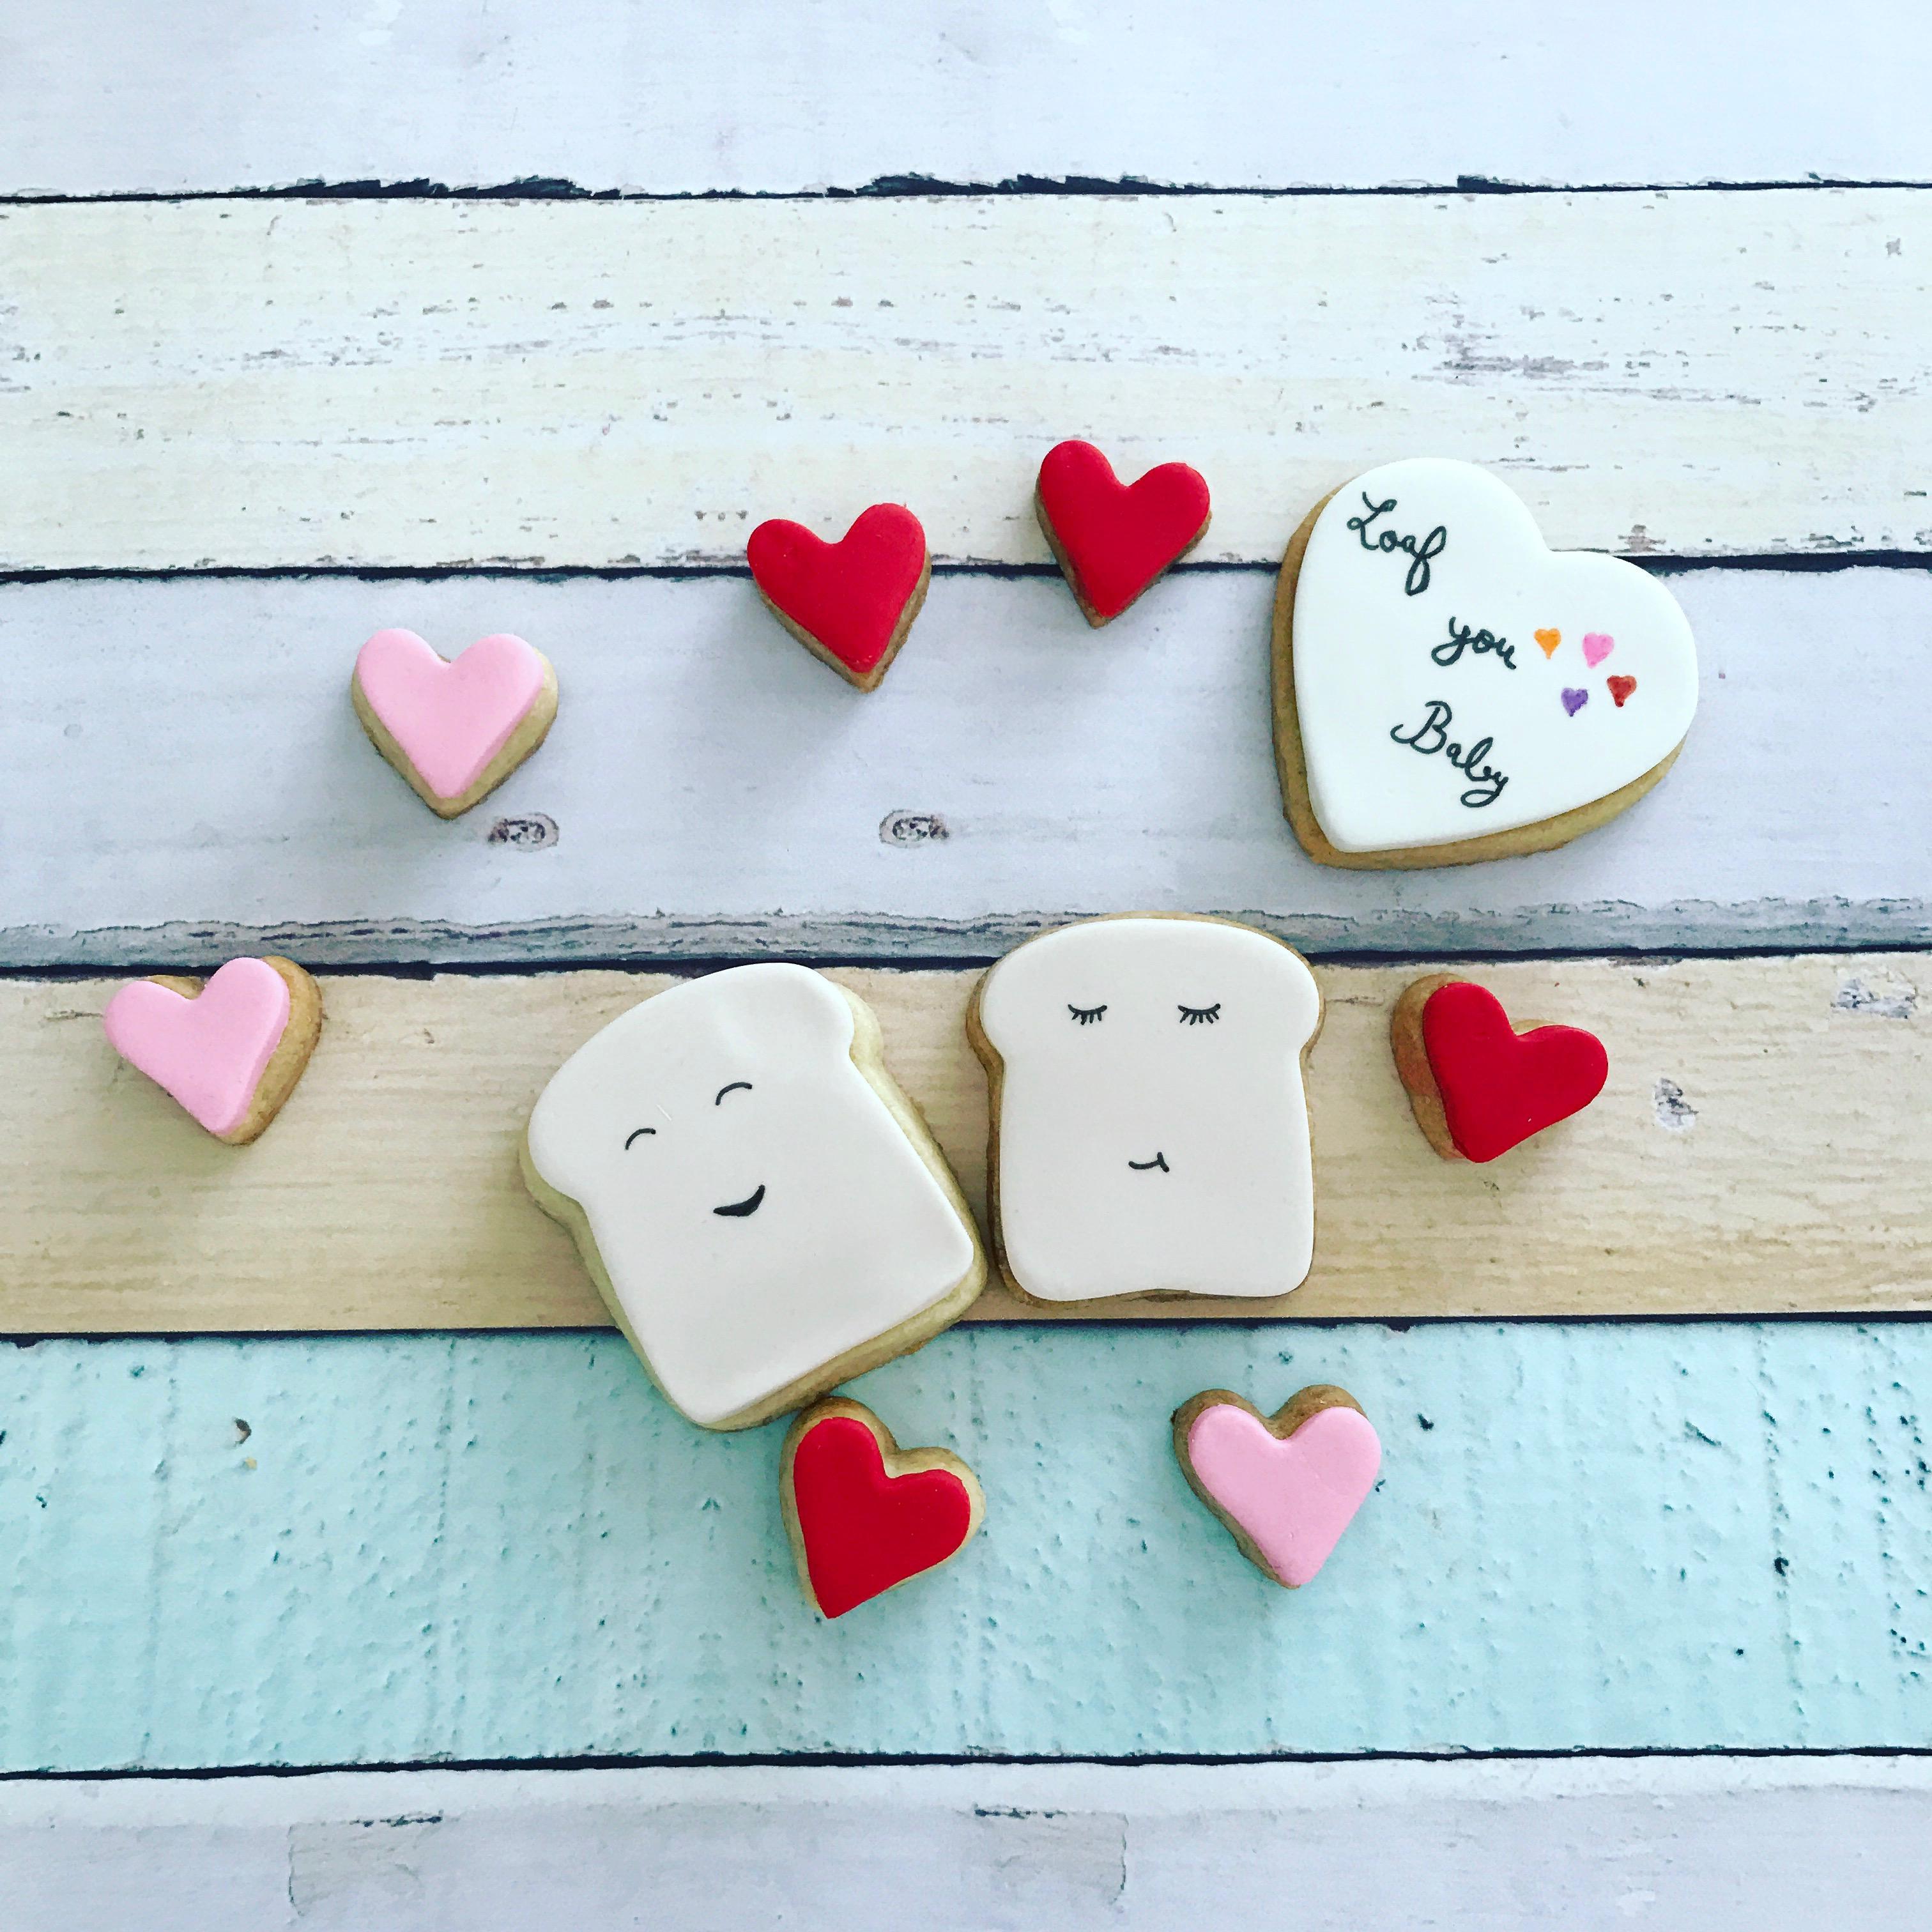 Breakfast toast and heart cookies